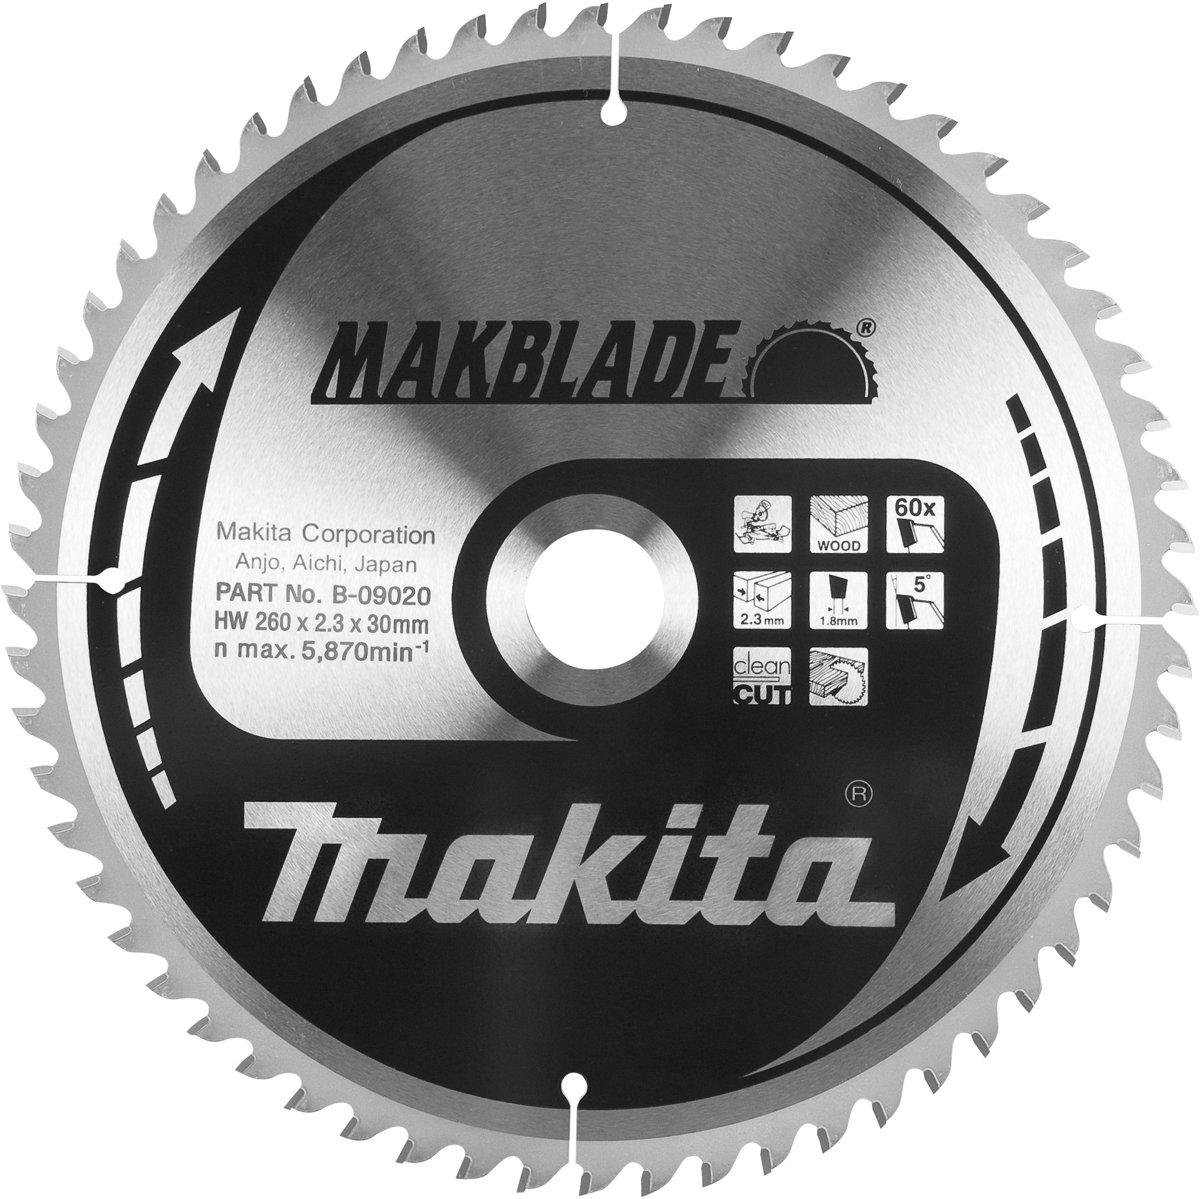 Makita B-09092 Zaagblad hout 216 millimeter MAK-B-09092